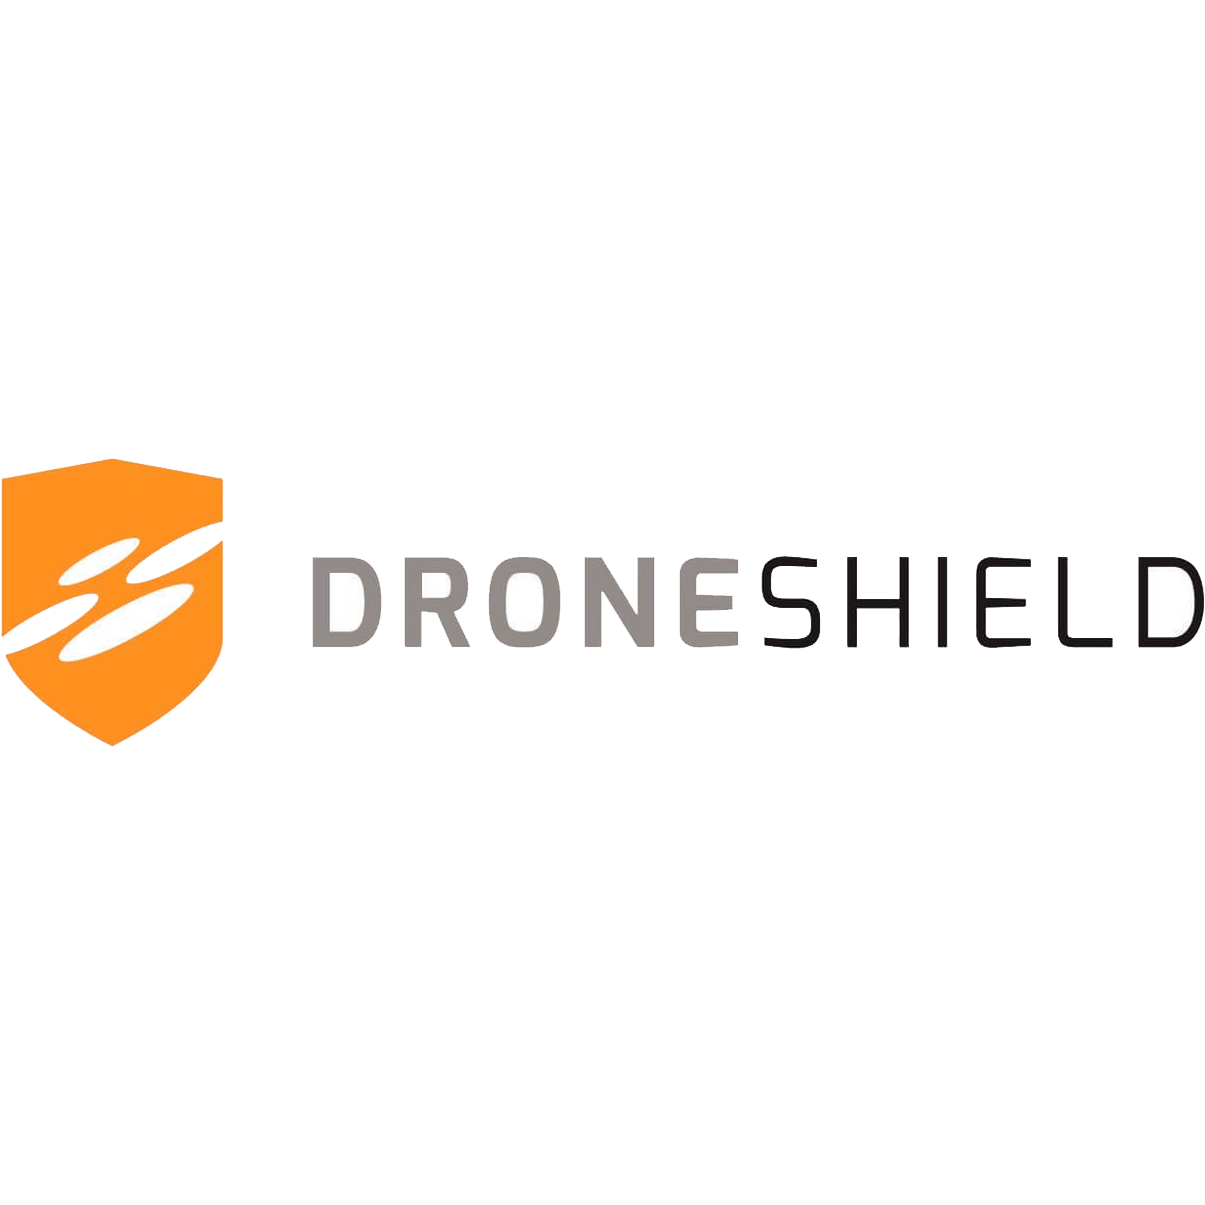 https://skaitech.al/wp-content/uploads/2021/08/logo-droneshield.png